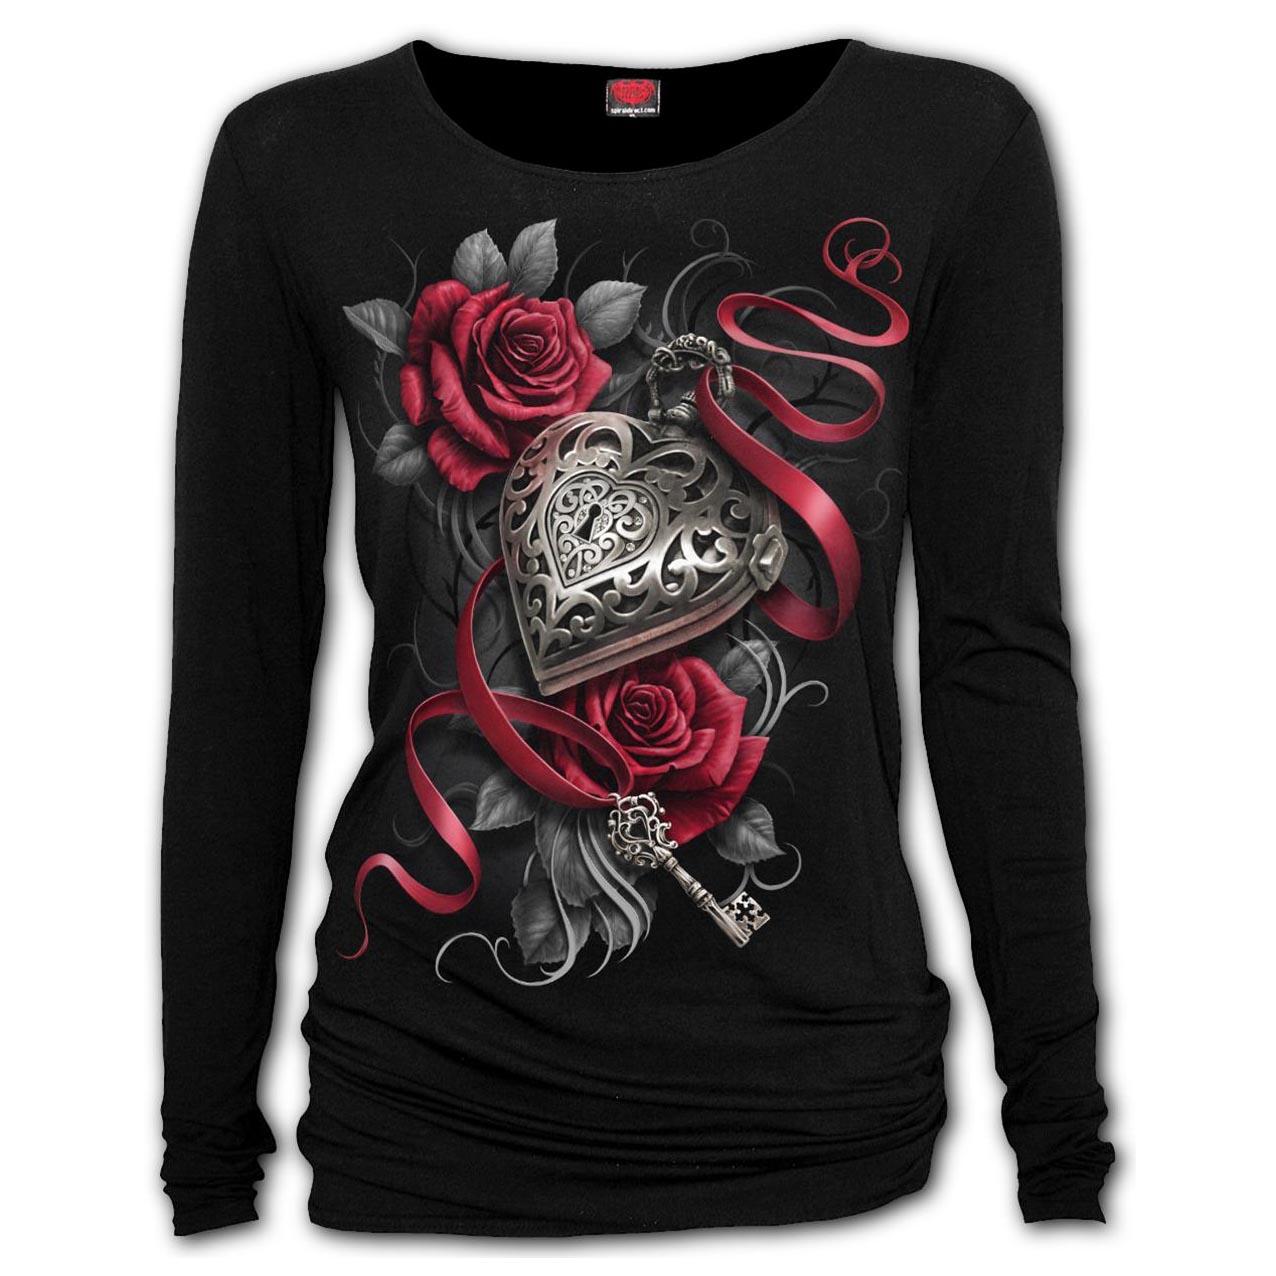 Spiral-Ladies-Black-Gothic-HEART-LOCKET-Rose-Key-L-Sleeve-Top-All-Sizes thumbnail 5